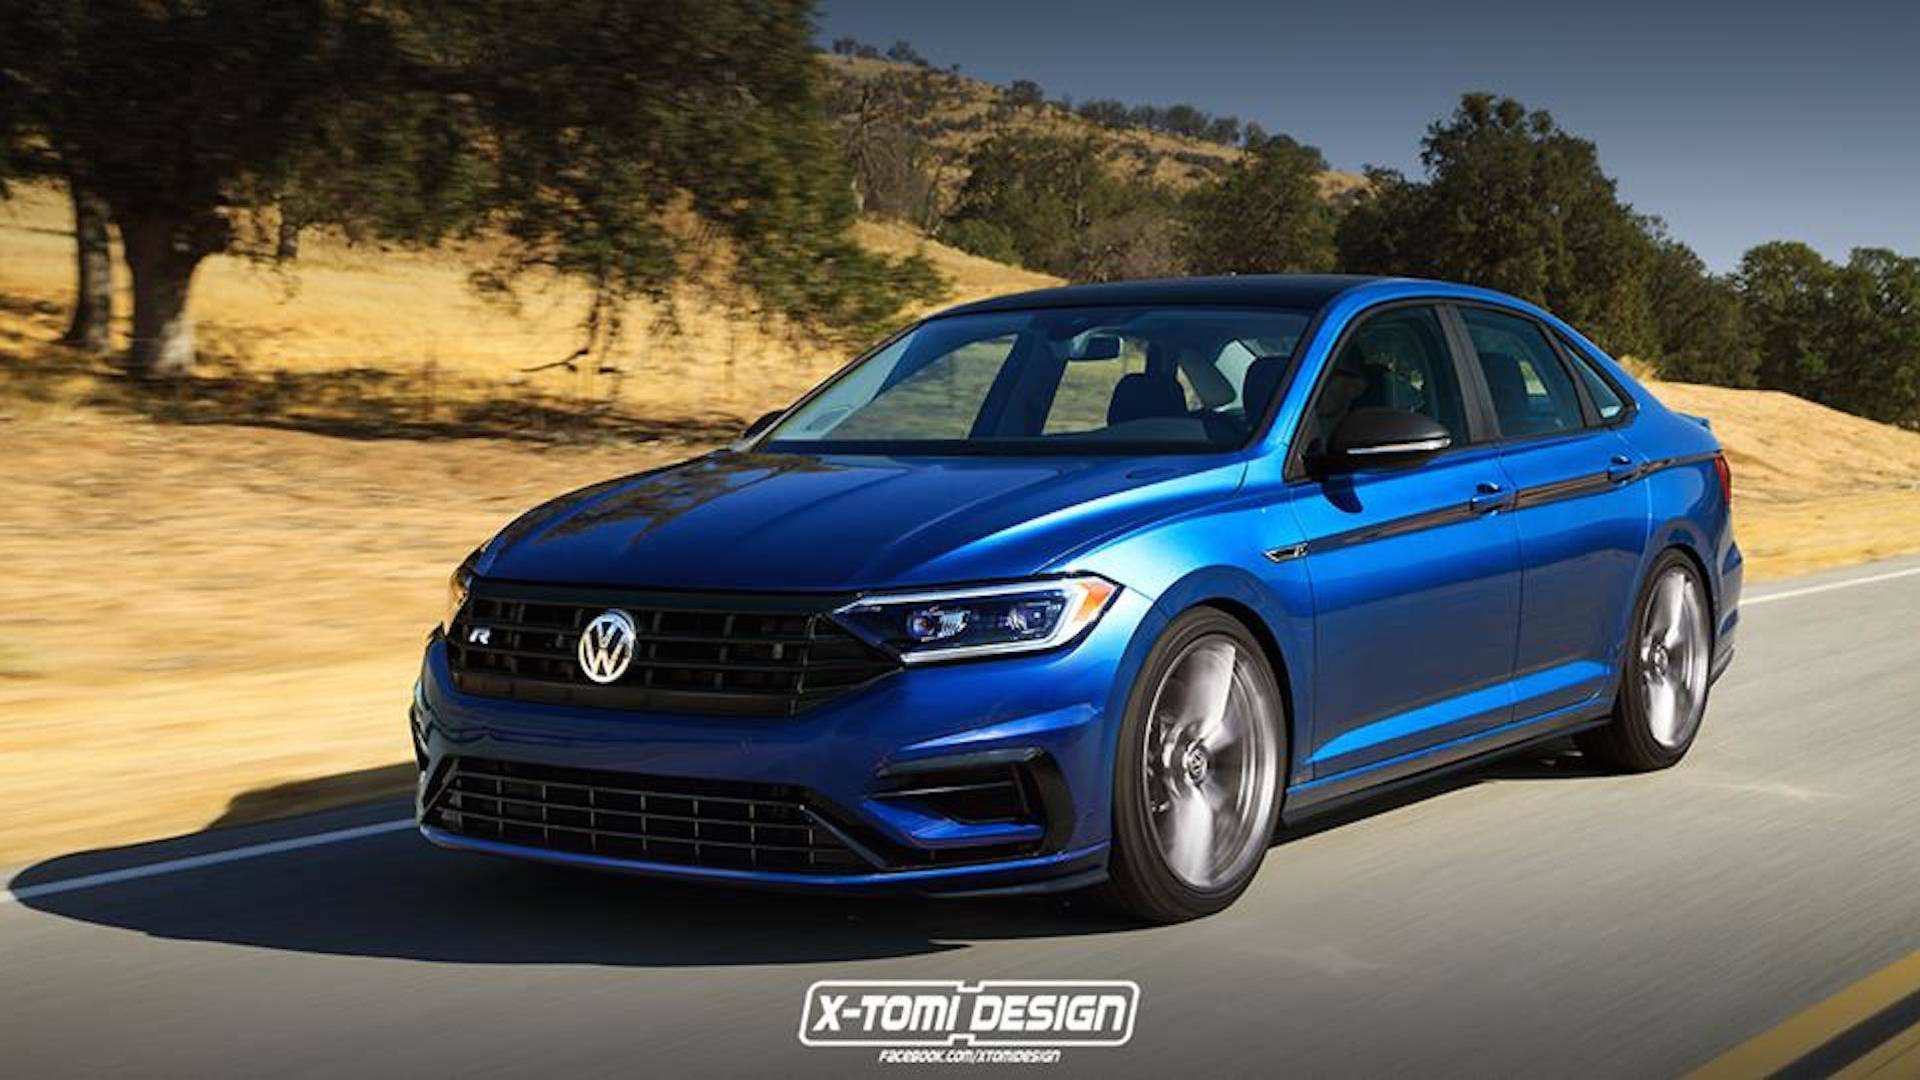 11 New Volkswagen Jetta 2019 Used Spy Shoot First Drive with Volkswagen Jetta 2019 Used Spy Shoot